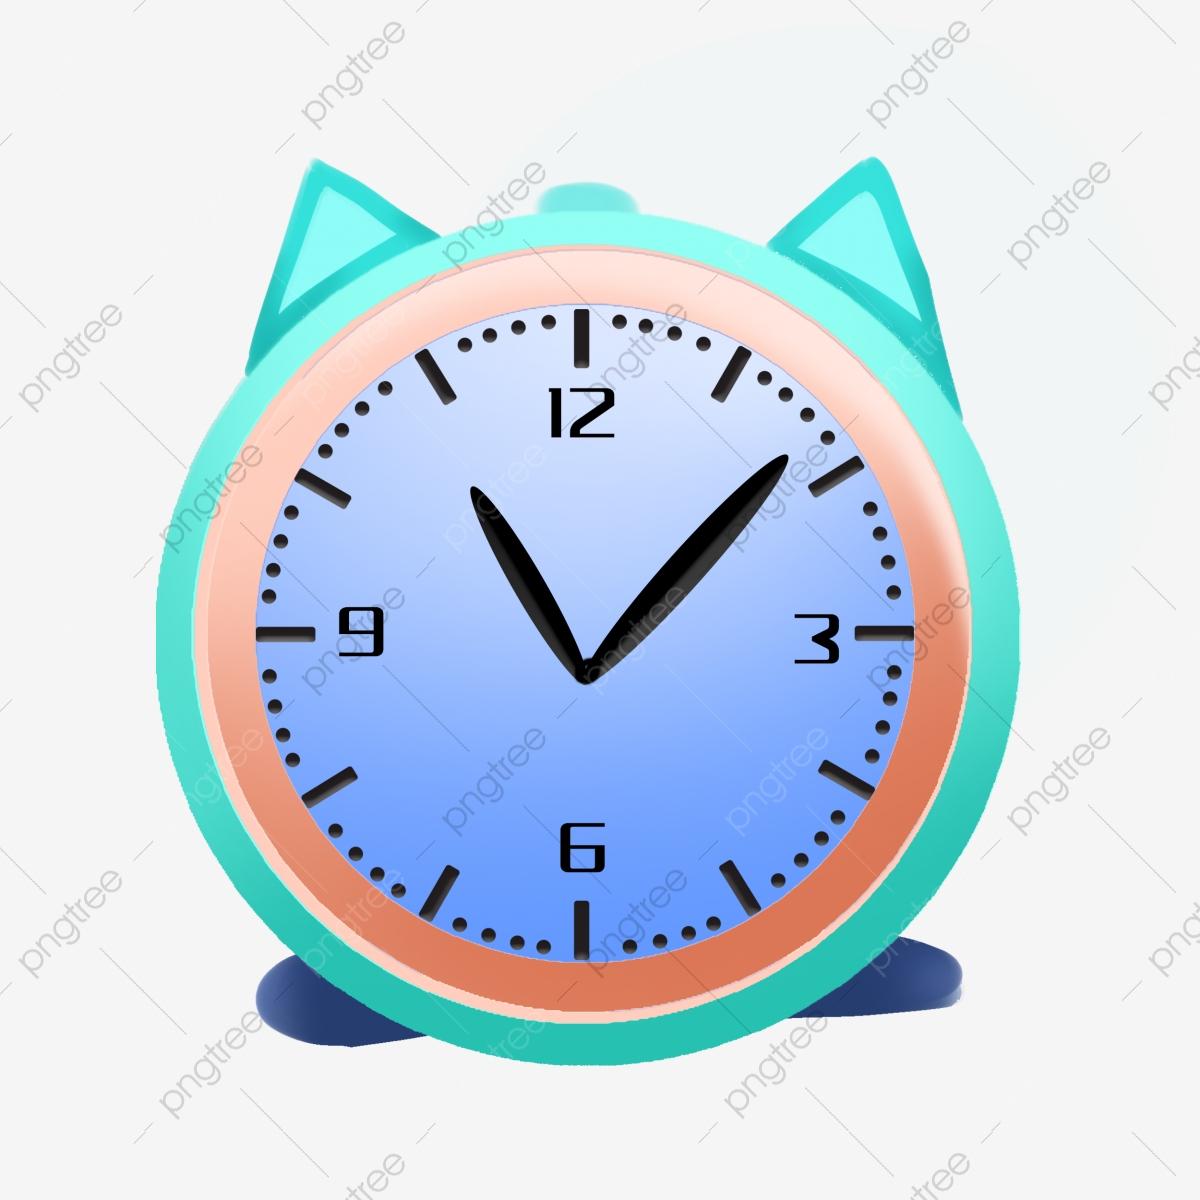 Réveil Horloge Illustration D'horloge Illustration De Dessin avec Dessin D Horloge